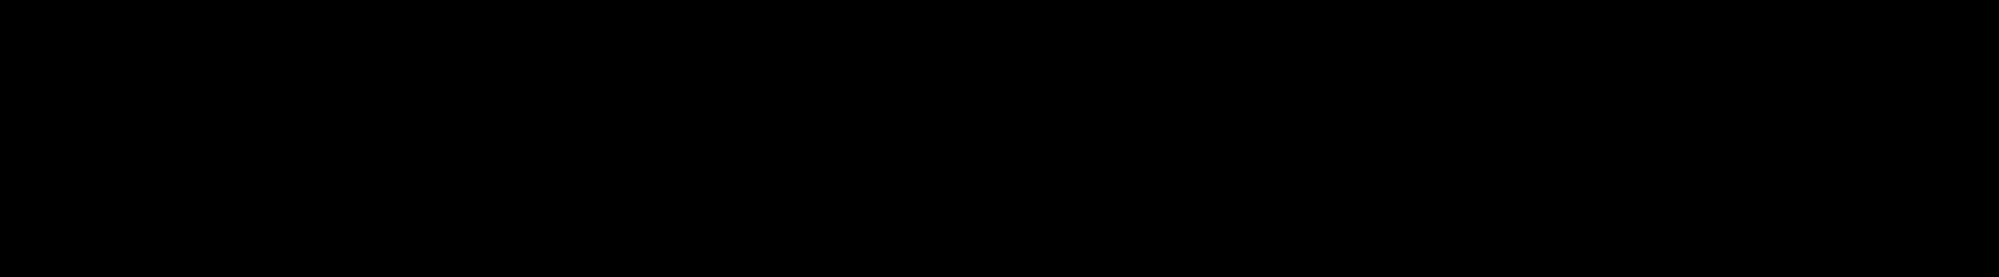 image36.png